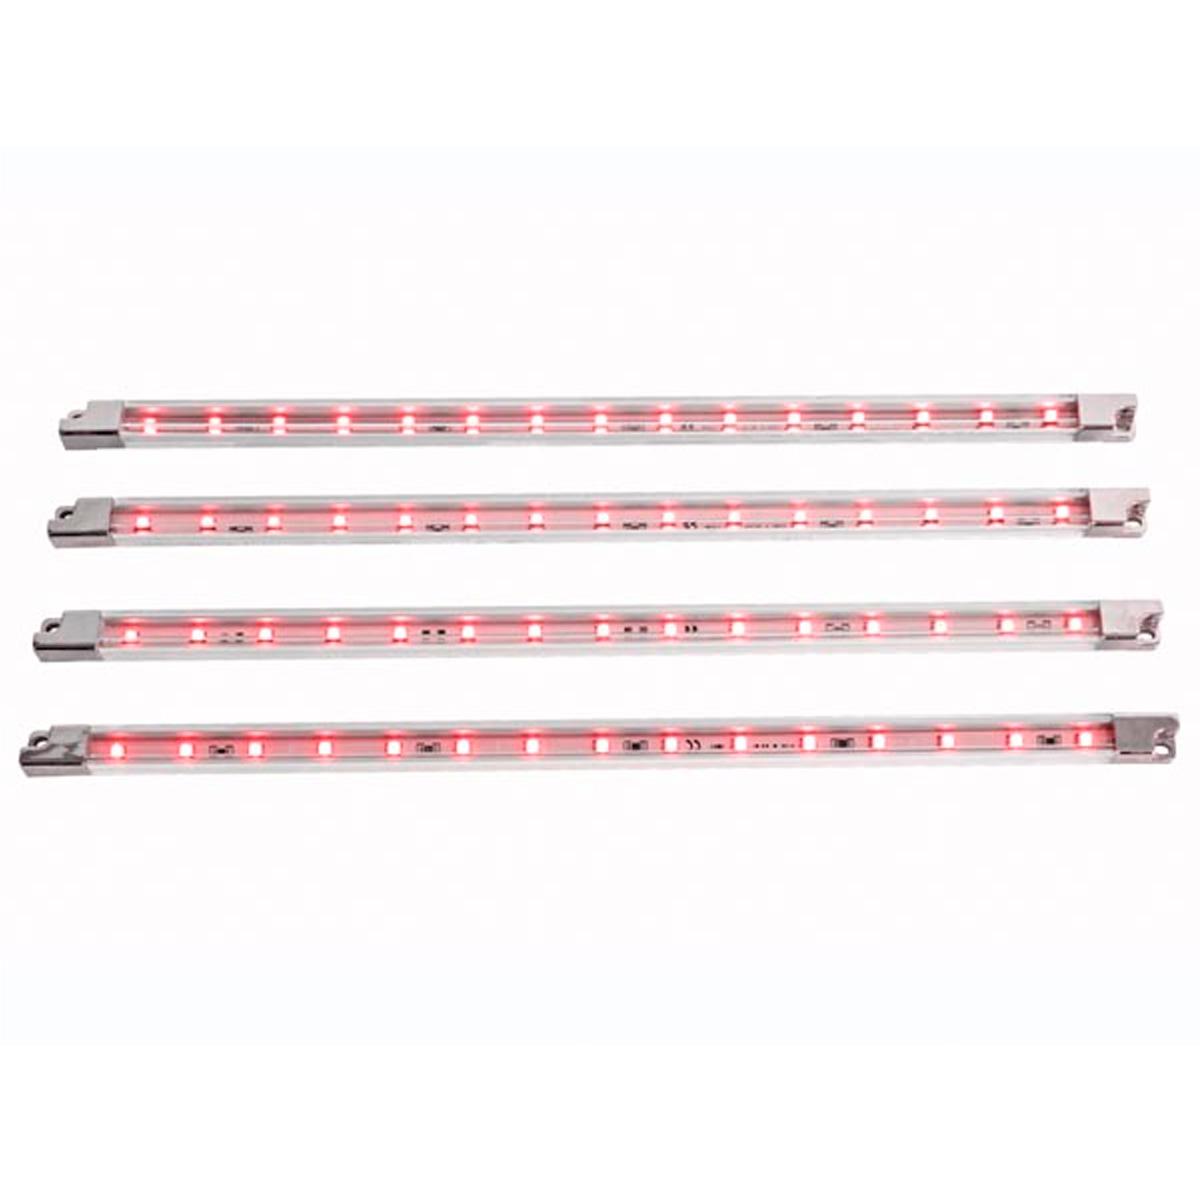 Tira de led decorativa x4 12v rojo - Iluminacion led decorativa ...